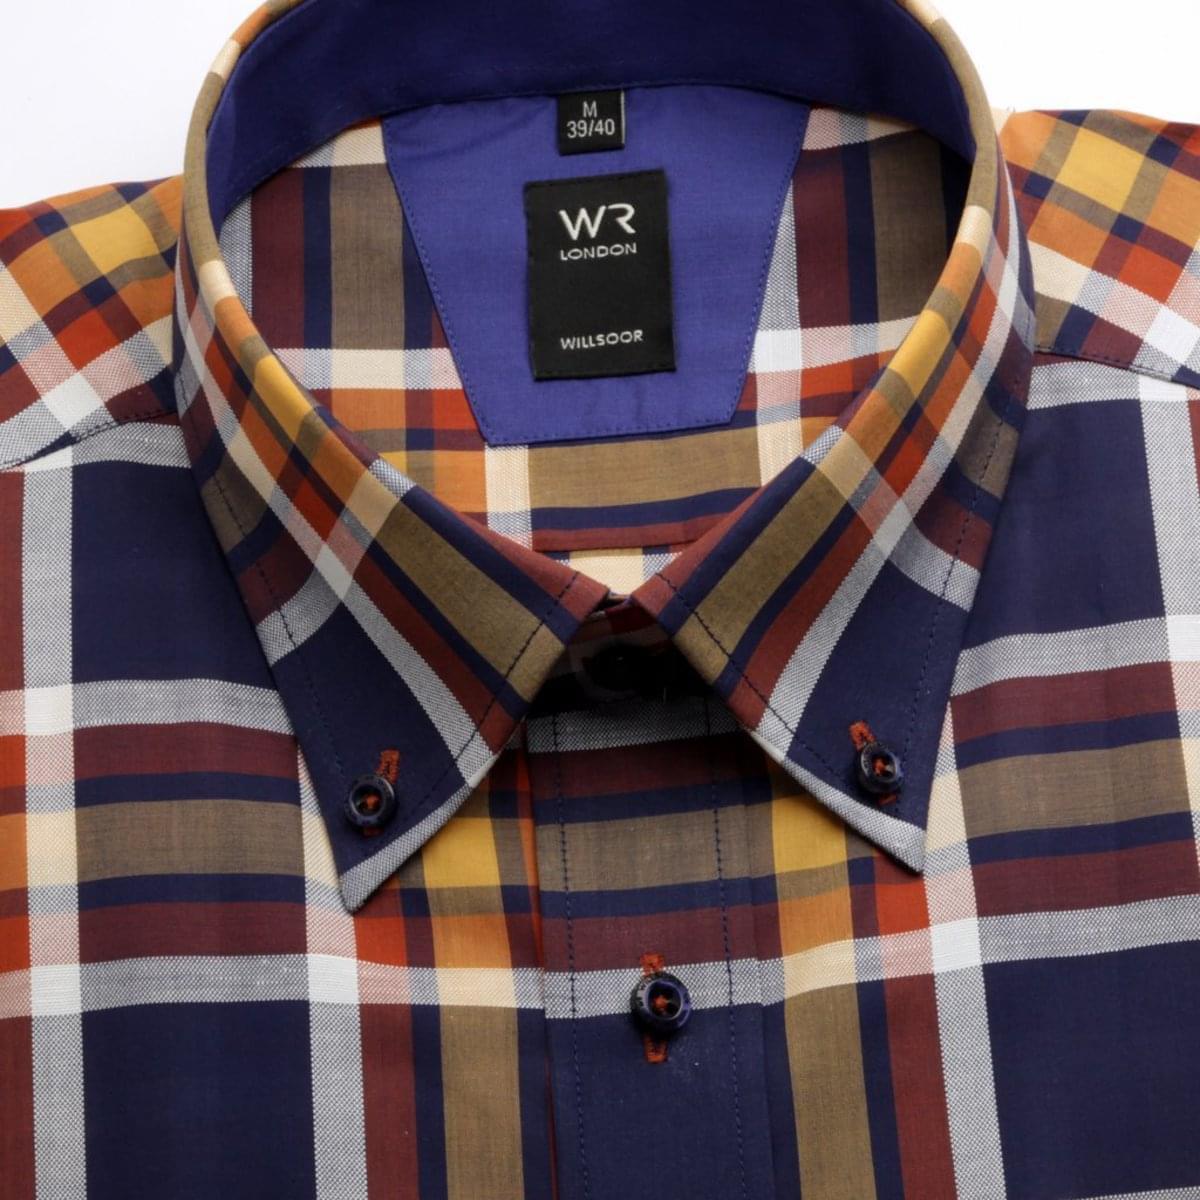 Willsoor Pánská košile WR London (výška 176-182) 1907 176-182 / M (39/40)